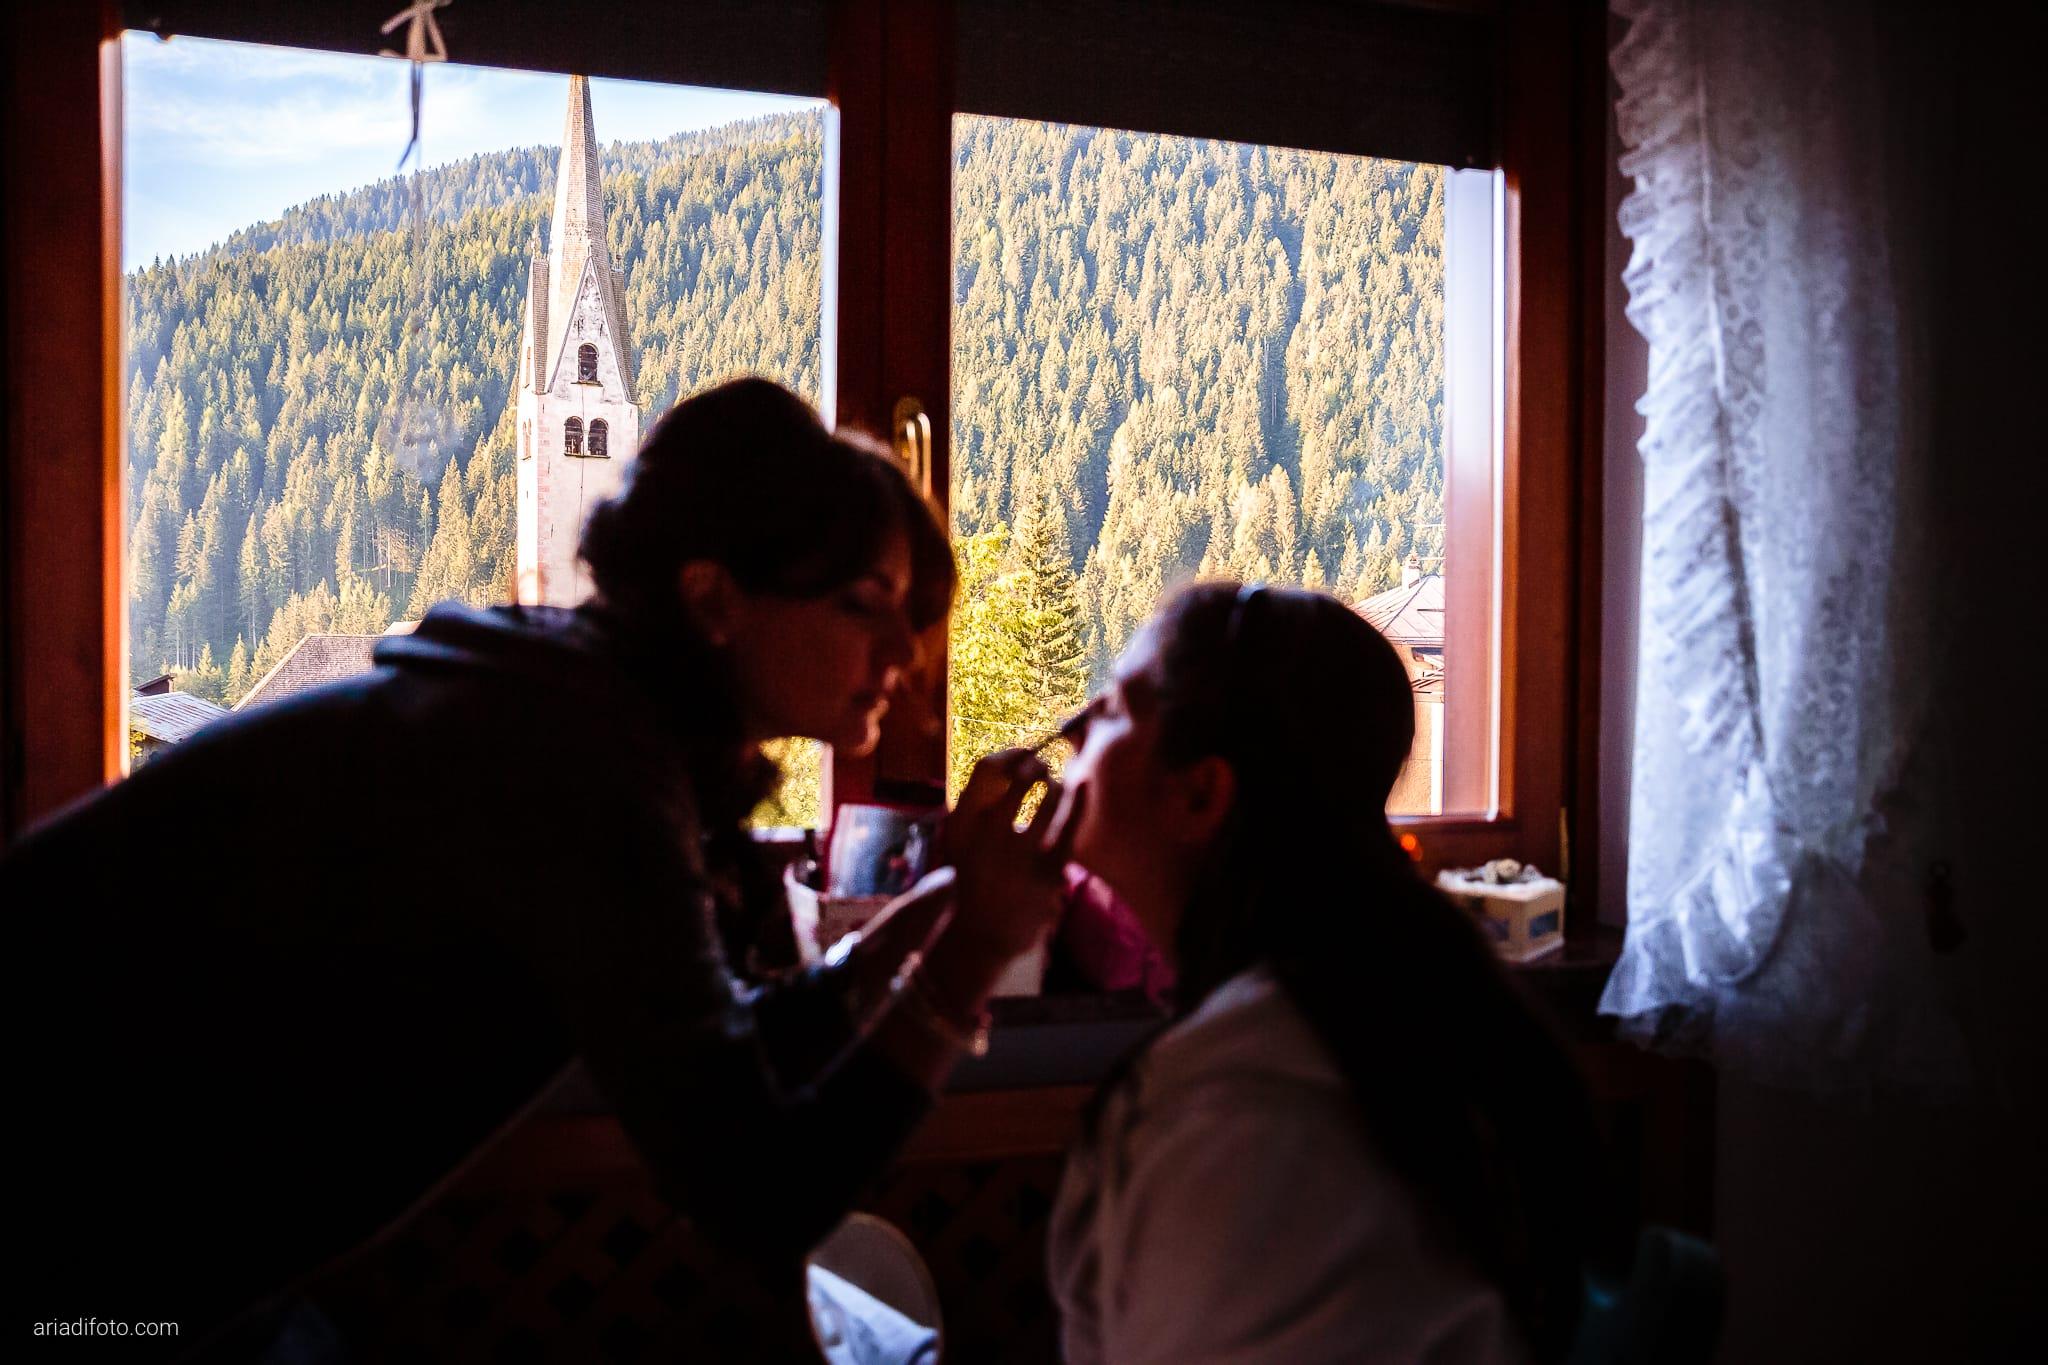 Elisa Gabriele matrimonio Veneto Val Zoldana Belluno preparativi trucco campanile